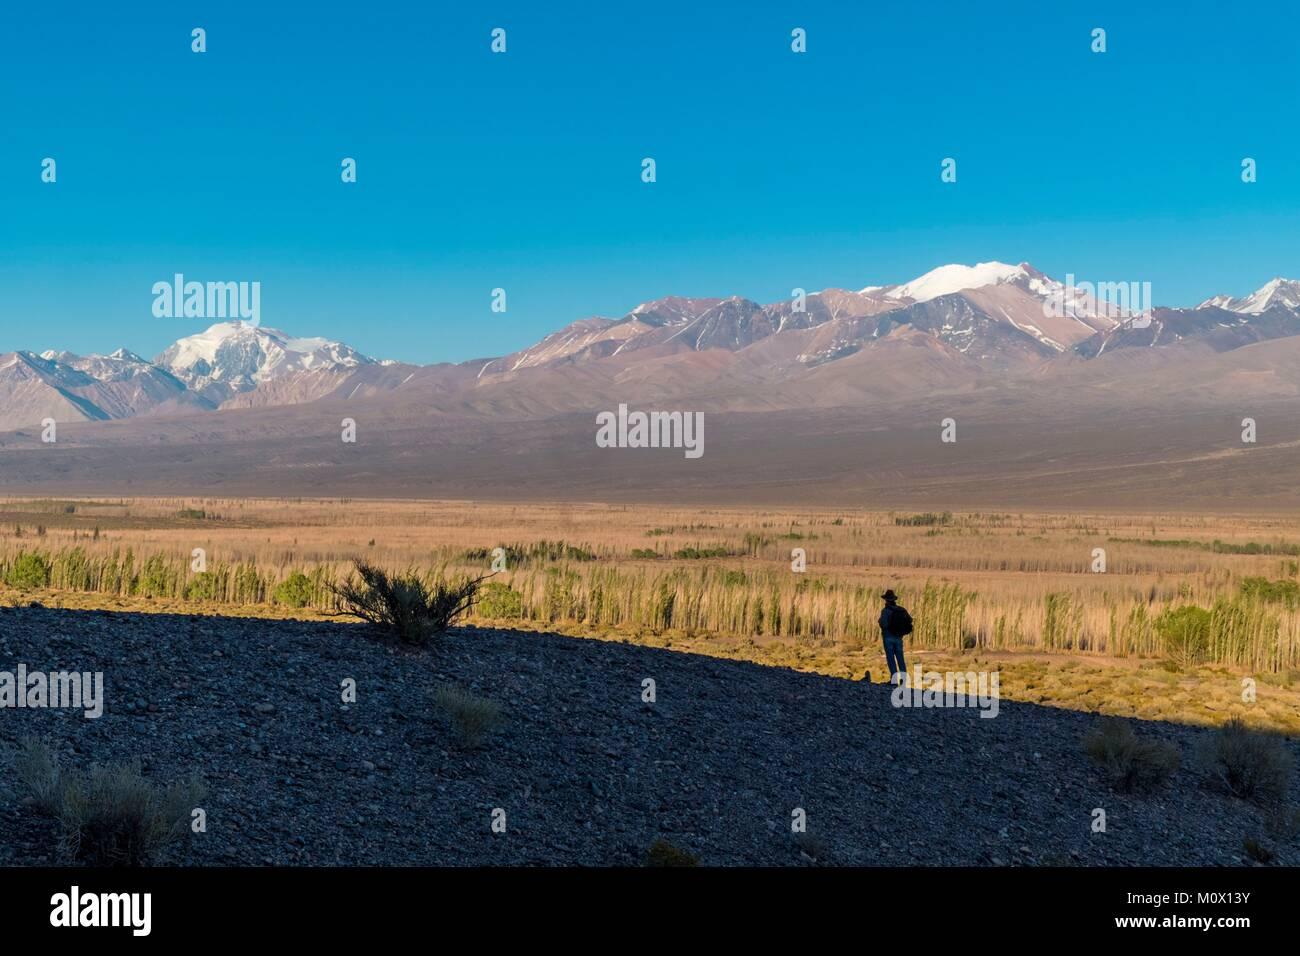 Argentina,San Juan Province,Calingasta Department,Cordillera at Barreal - Stock Image